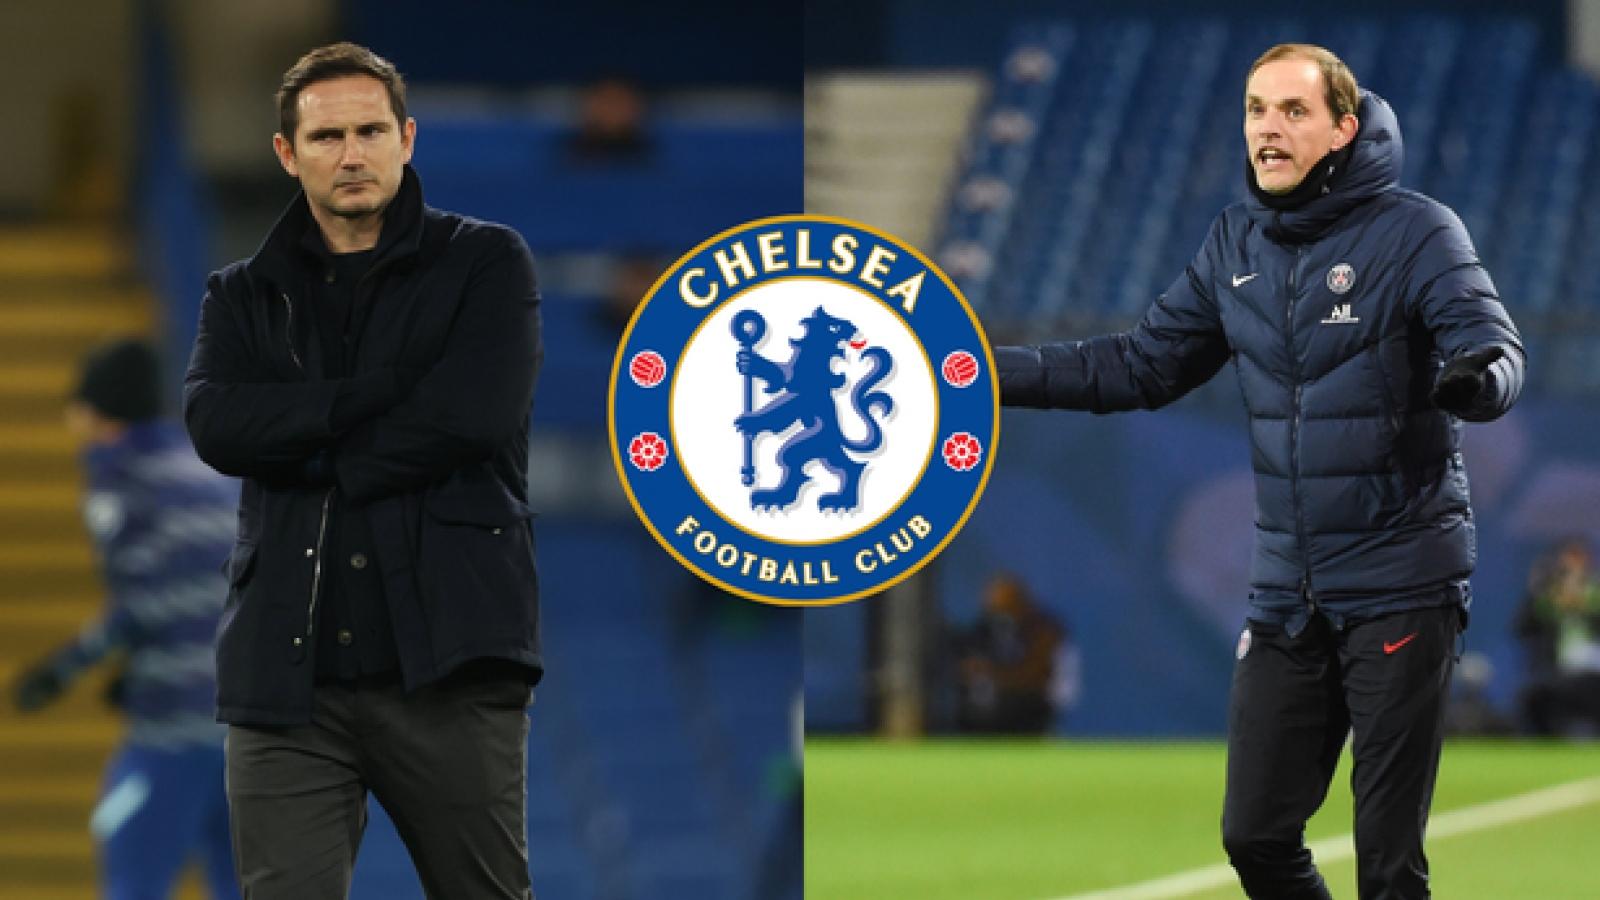 Chelsea chính thức sa thải Frank Lampard, Thomas Tuchel chuẩn bị kế nhiệm